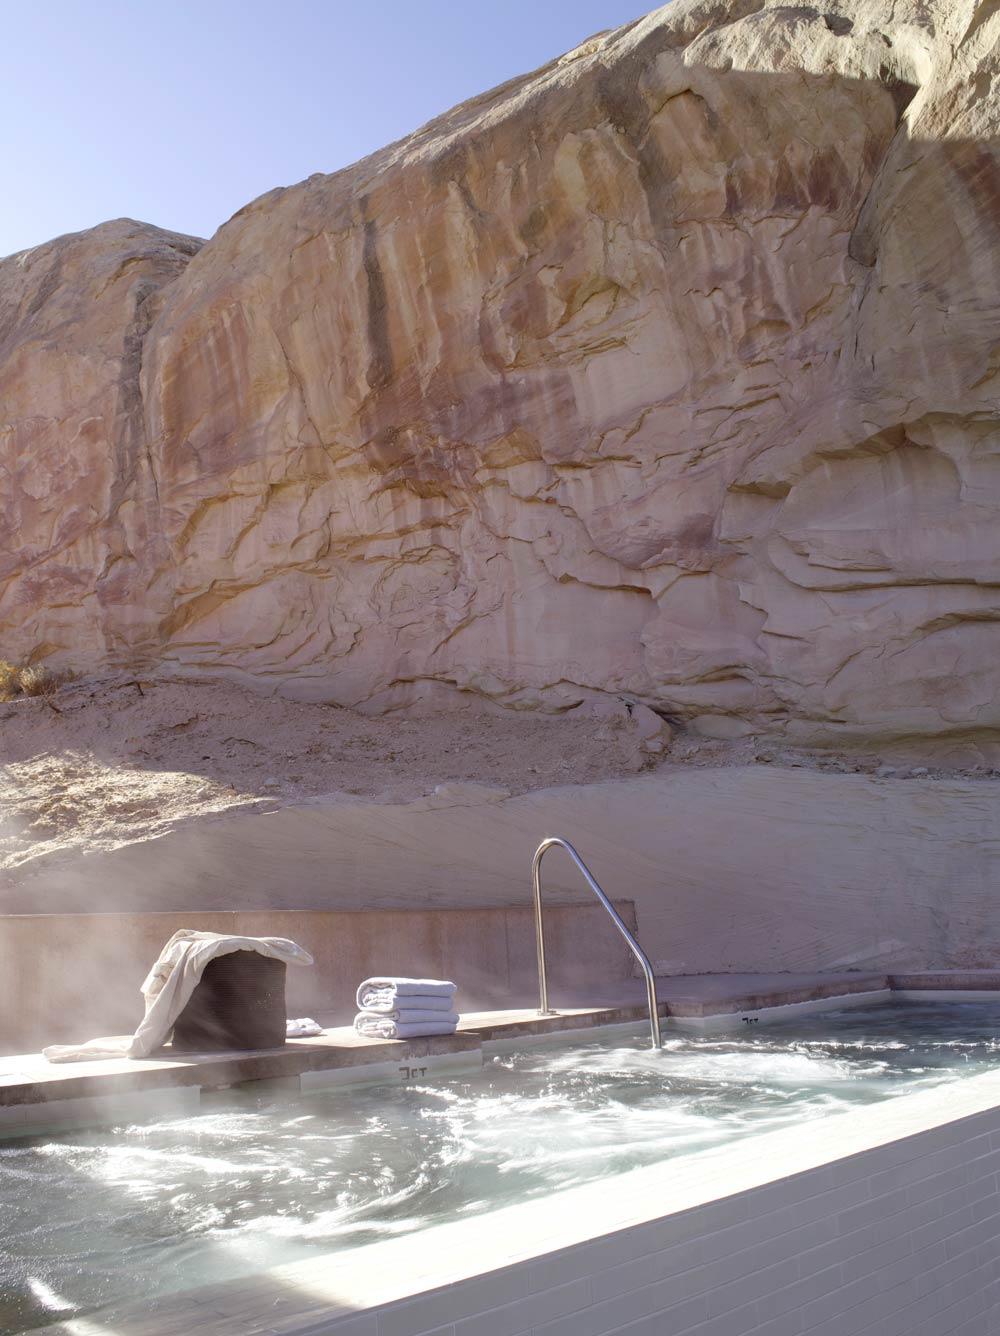 Main Swimming Pool Jacuzzi at Amangiri in Canyon PointSouthern Utah courtesy of Amanresorts